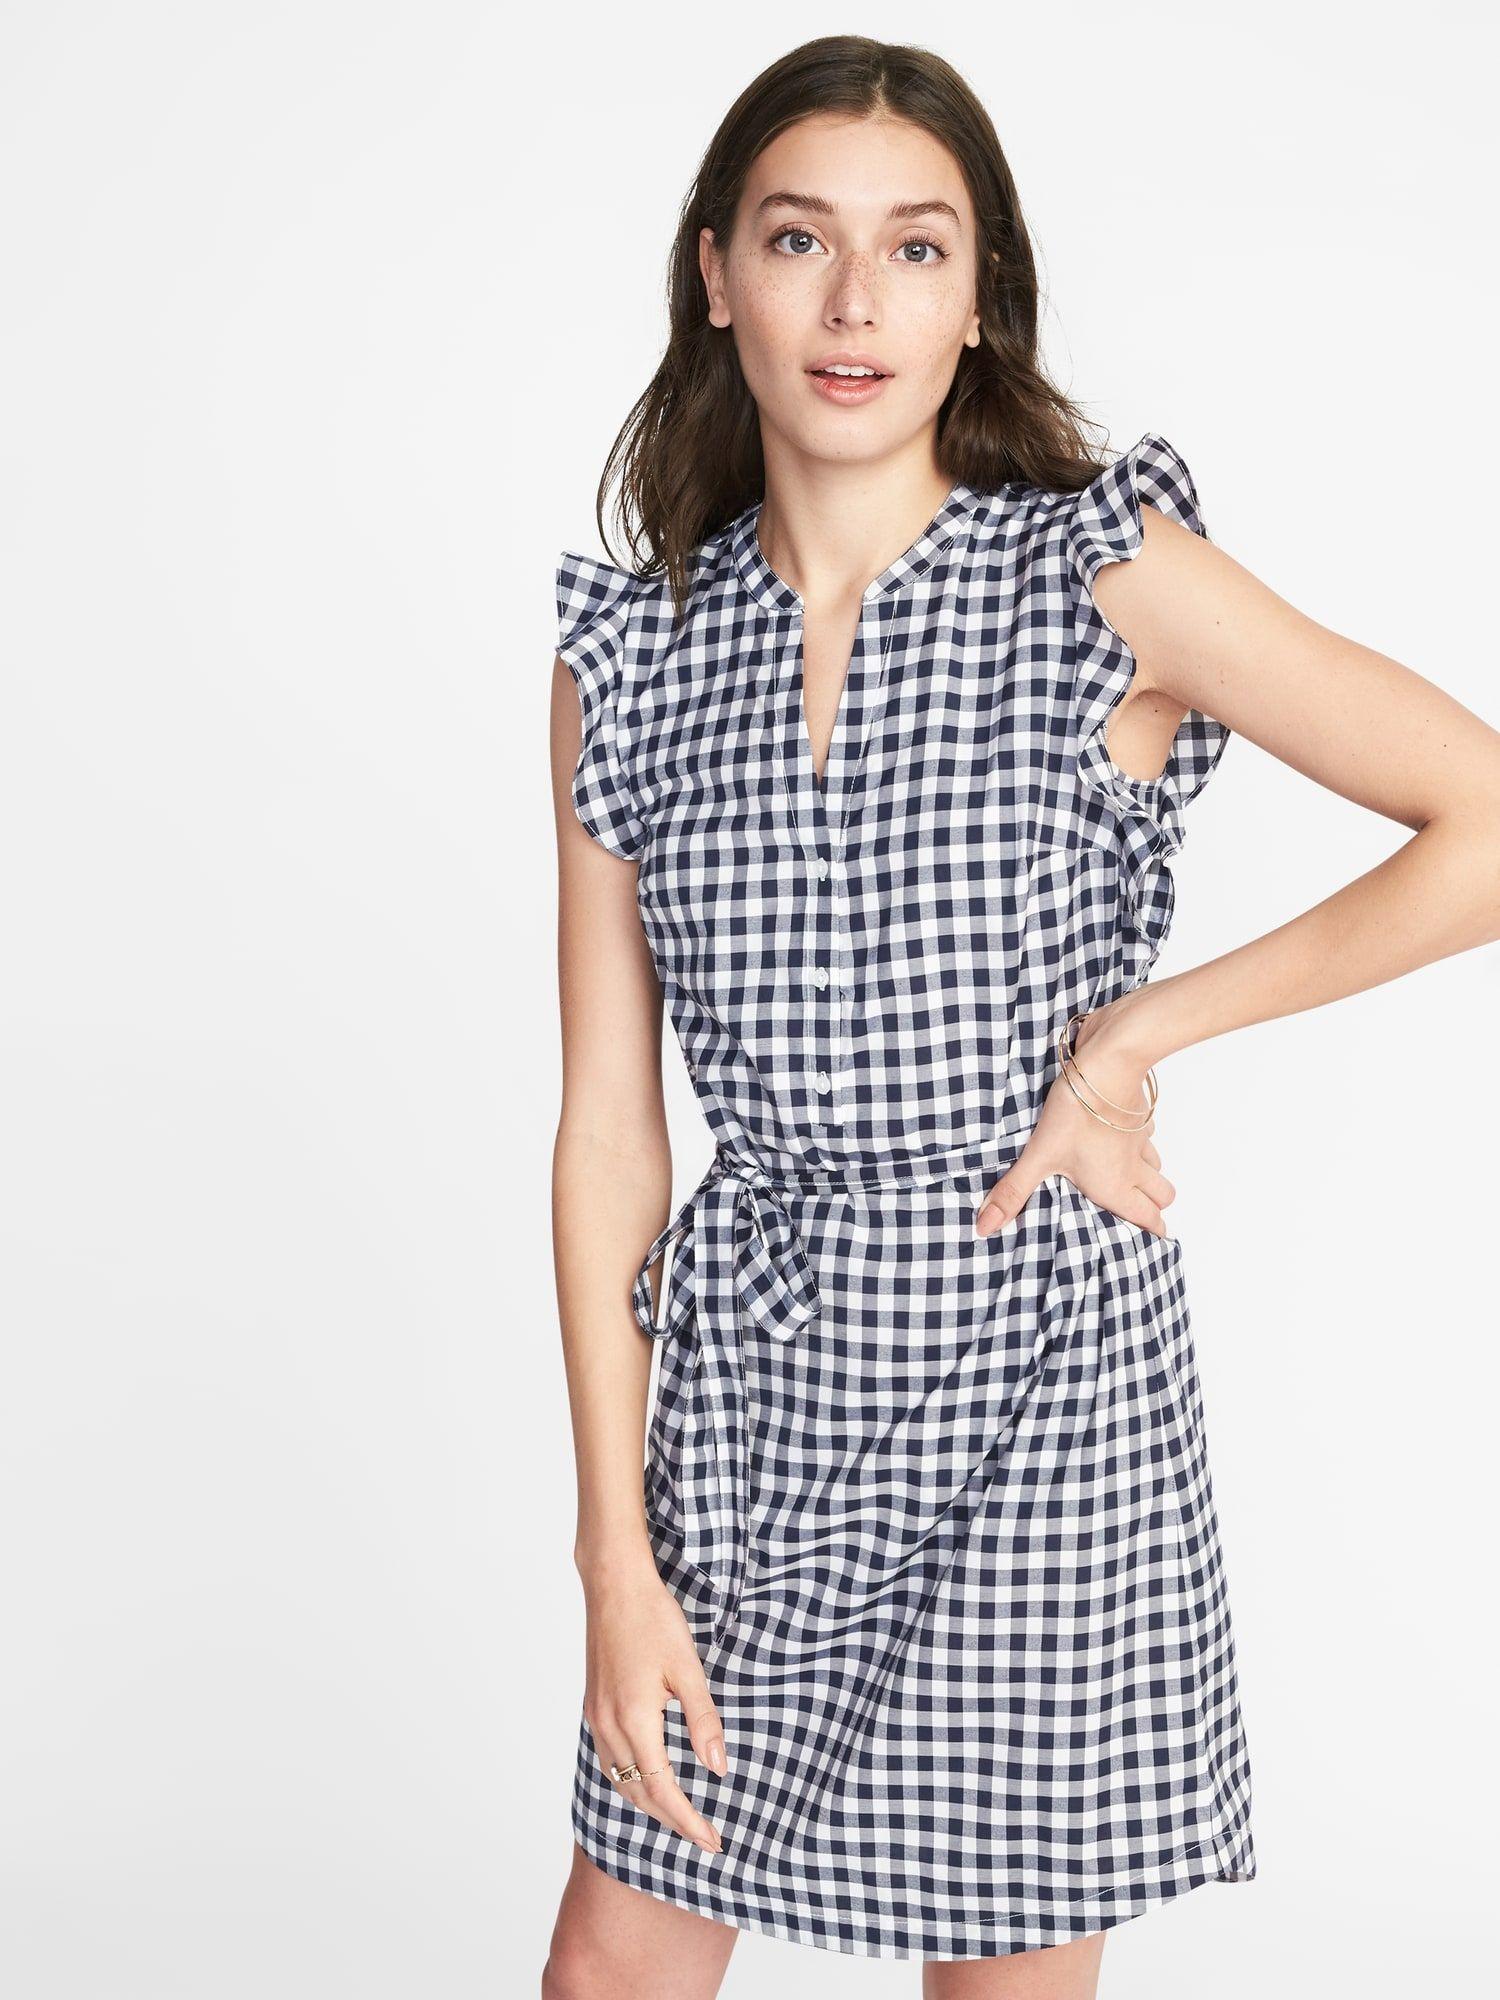 c1aeb9e85f0 Sleeveless Ruffle-Trim Tie-Belt Shirt Dress for Women | Sewing ...